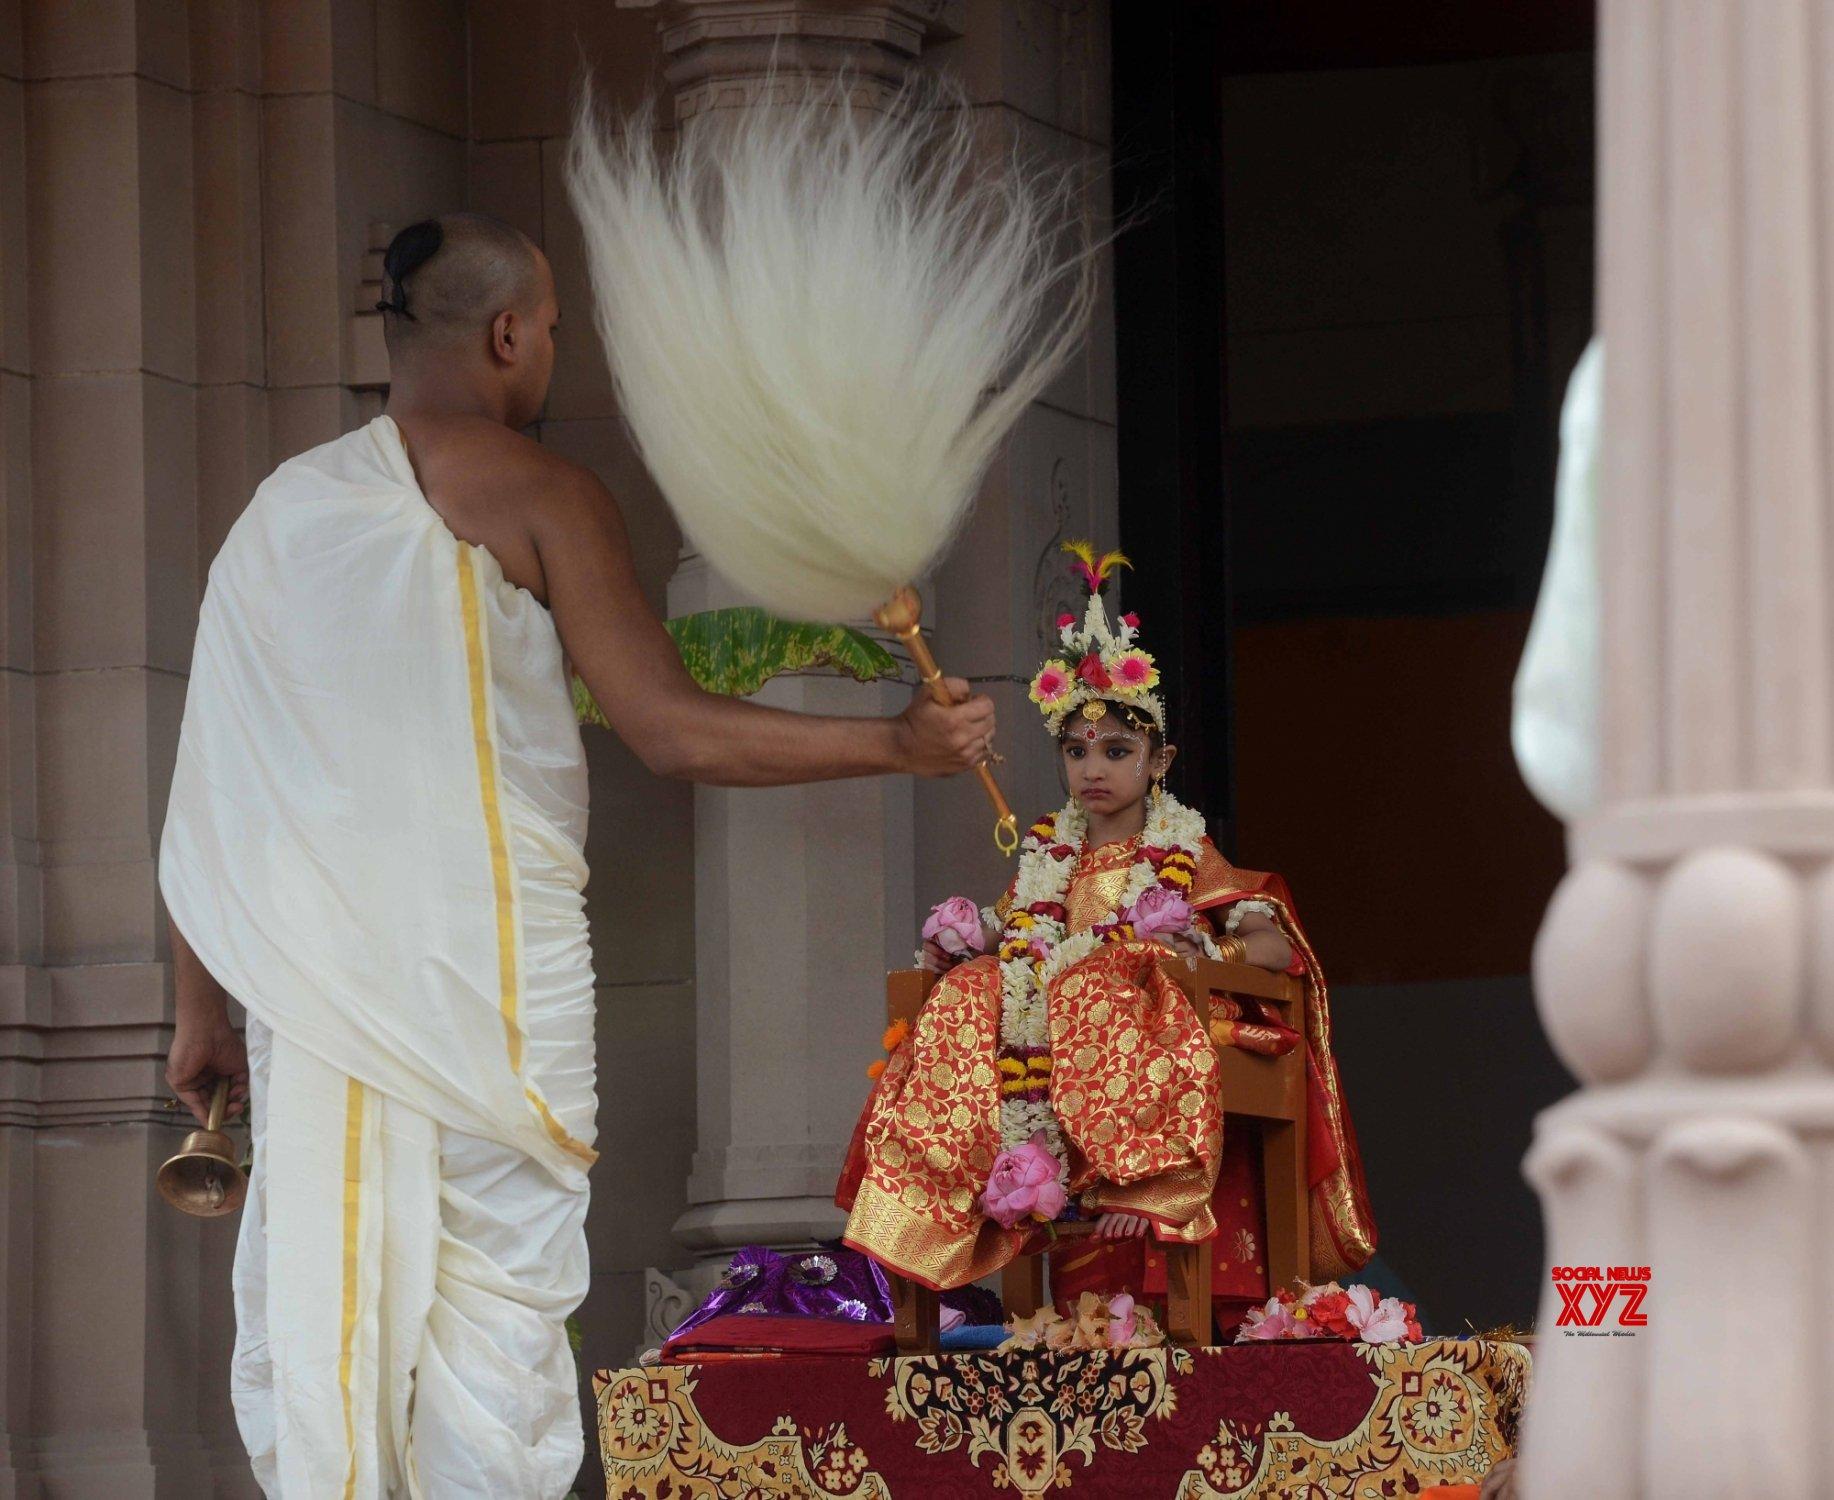 Kolkata : Priest performing Kumari puja on the occasion of Maha Asthami at Ramakrishna Mission in Belur Math Howrah on October 13, 2021. #Gallery